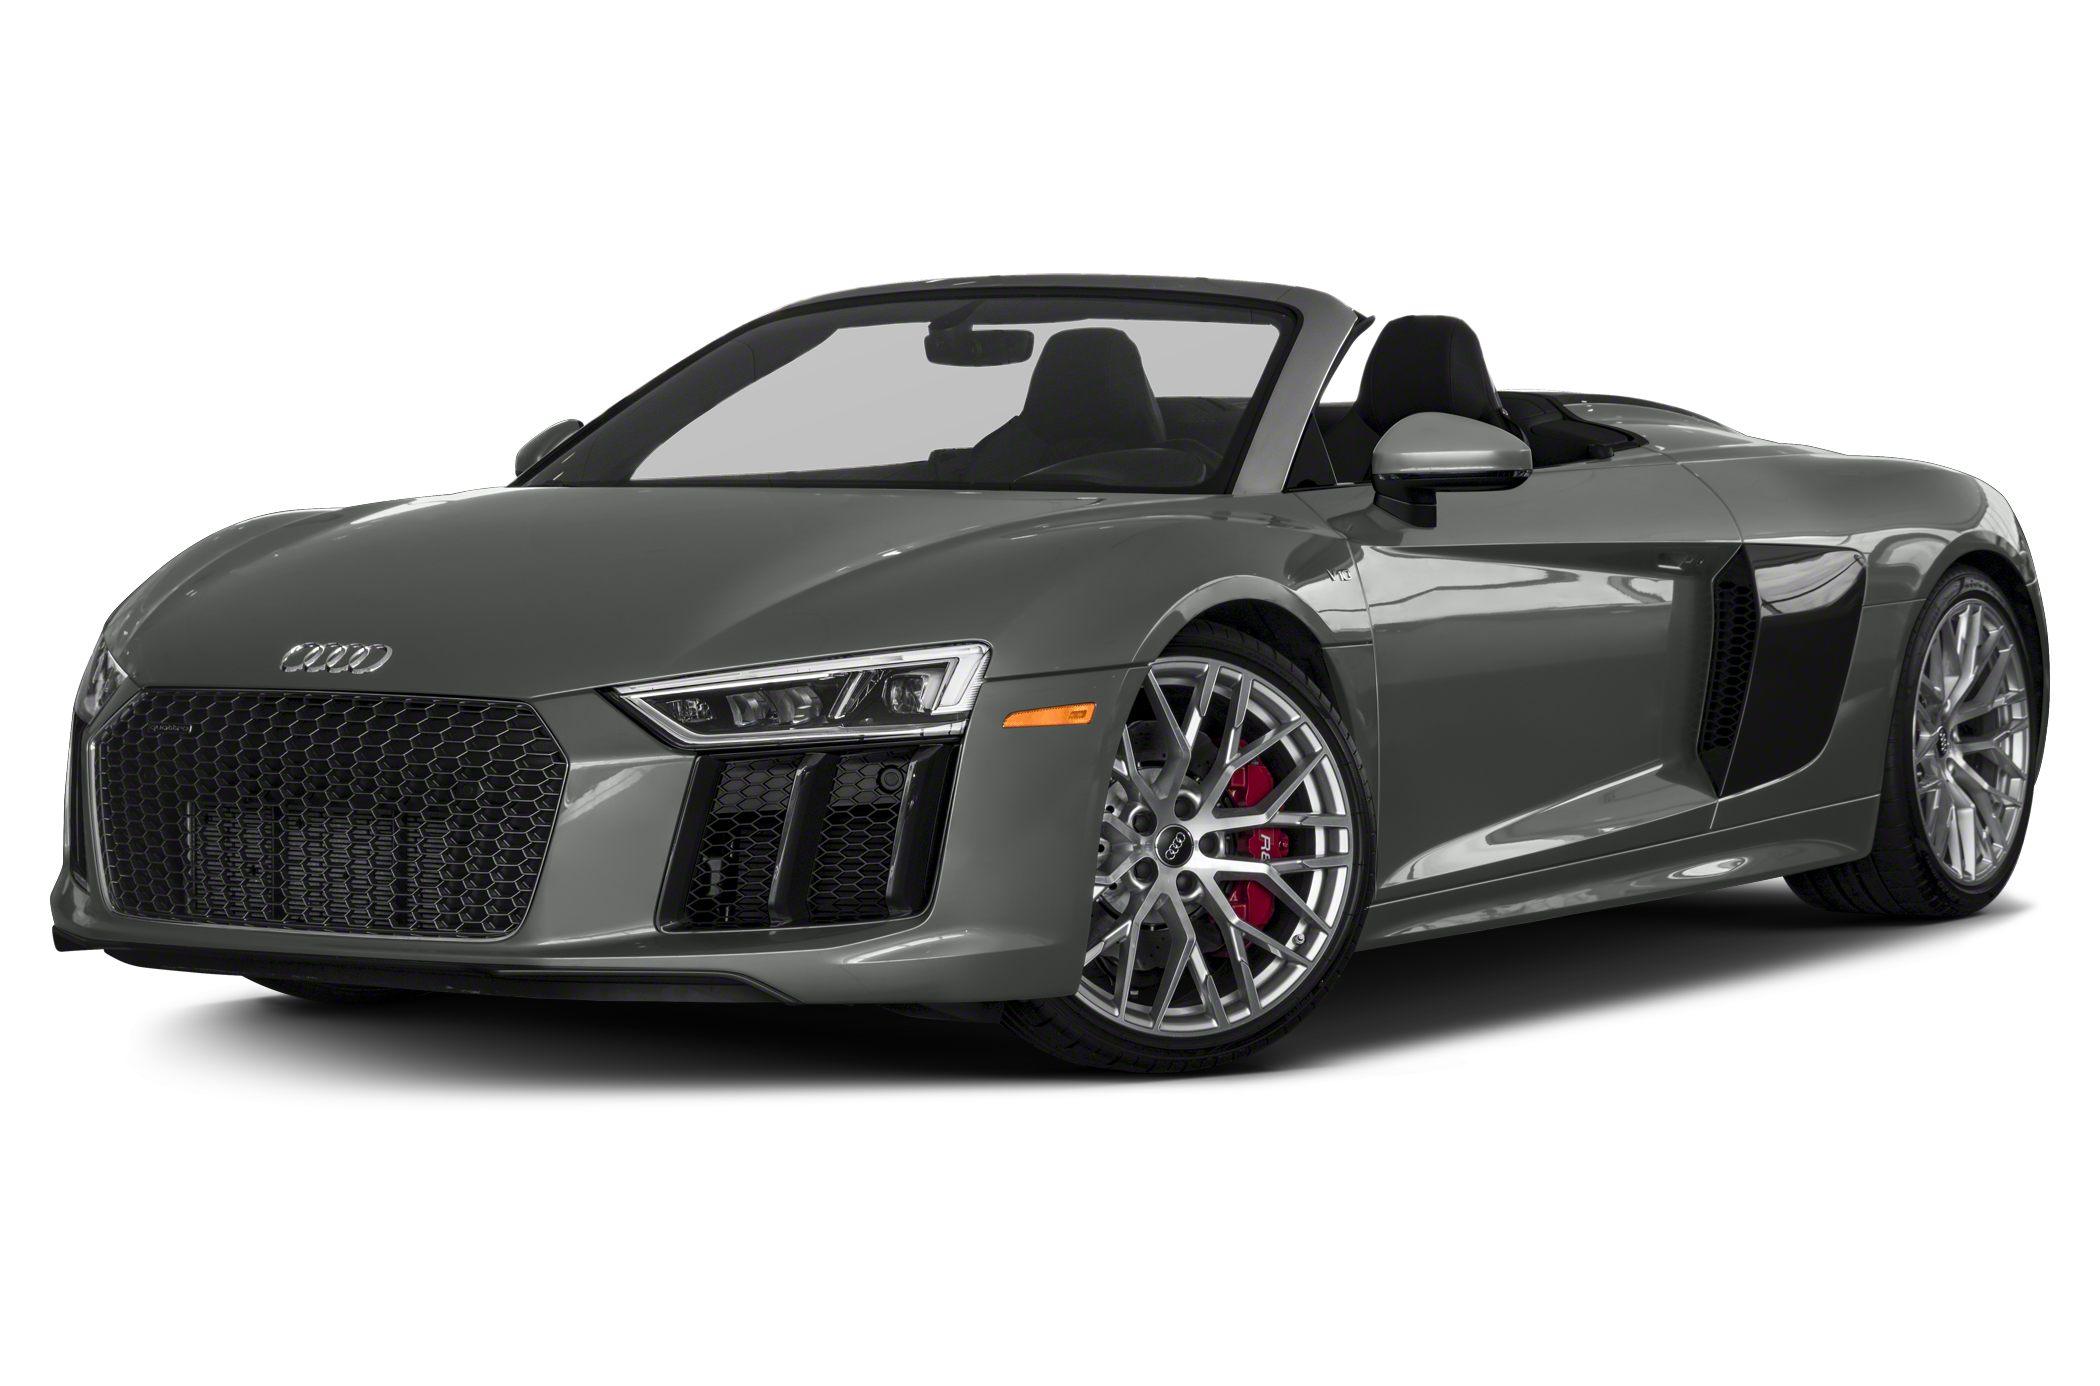 2018 Audi R8 5 2 V10 plus 2dr All wheel Drive quattro Spyder Equipment